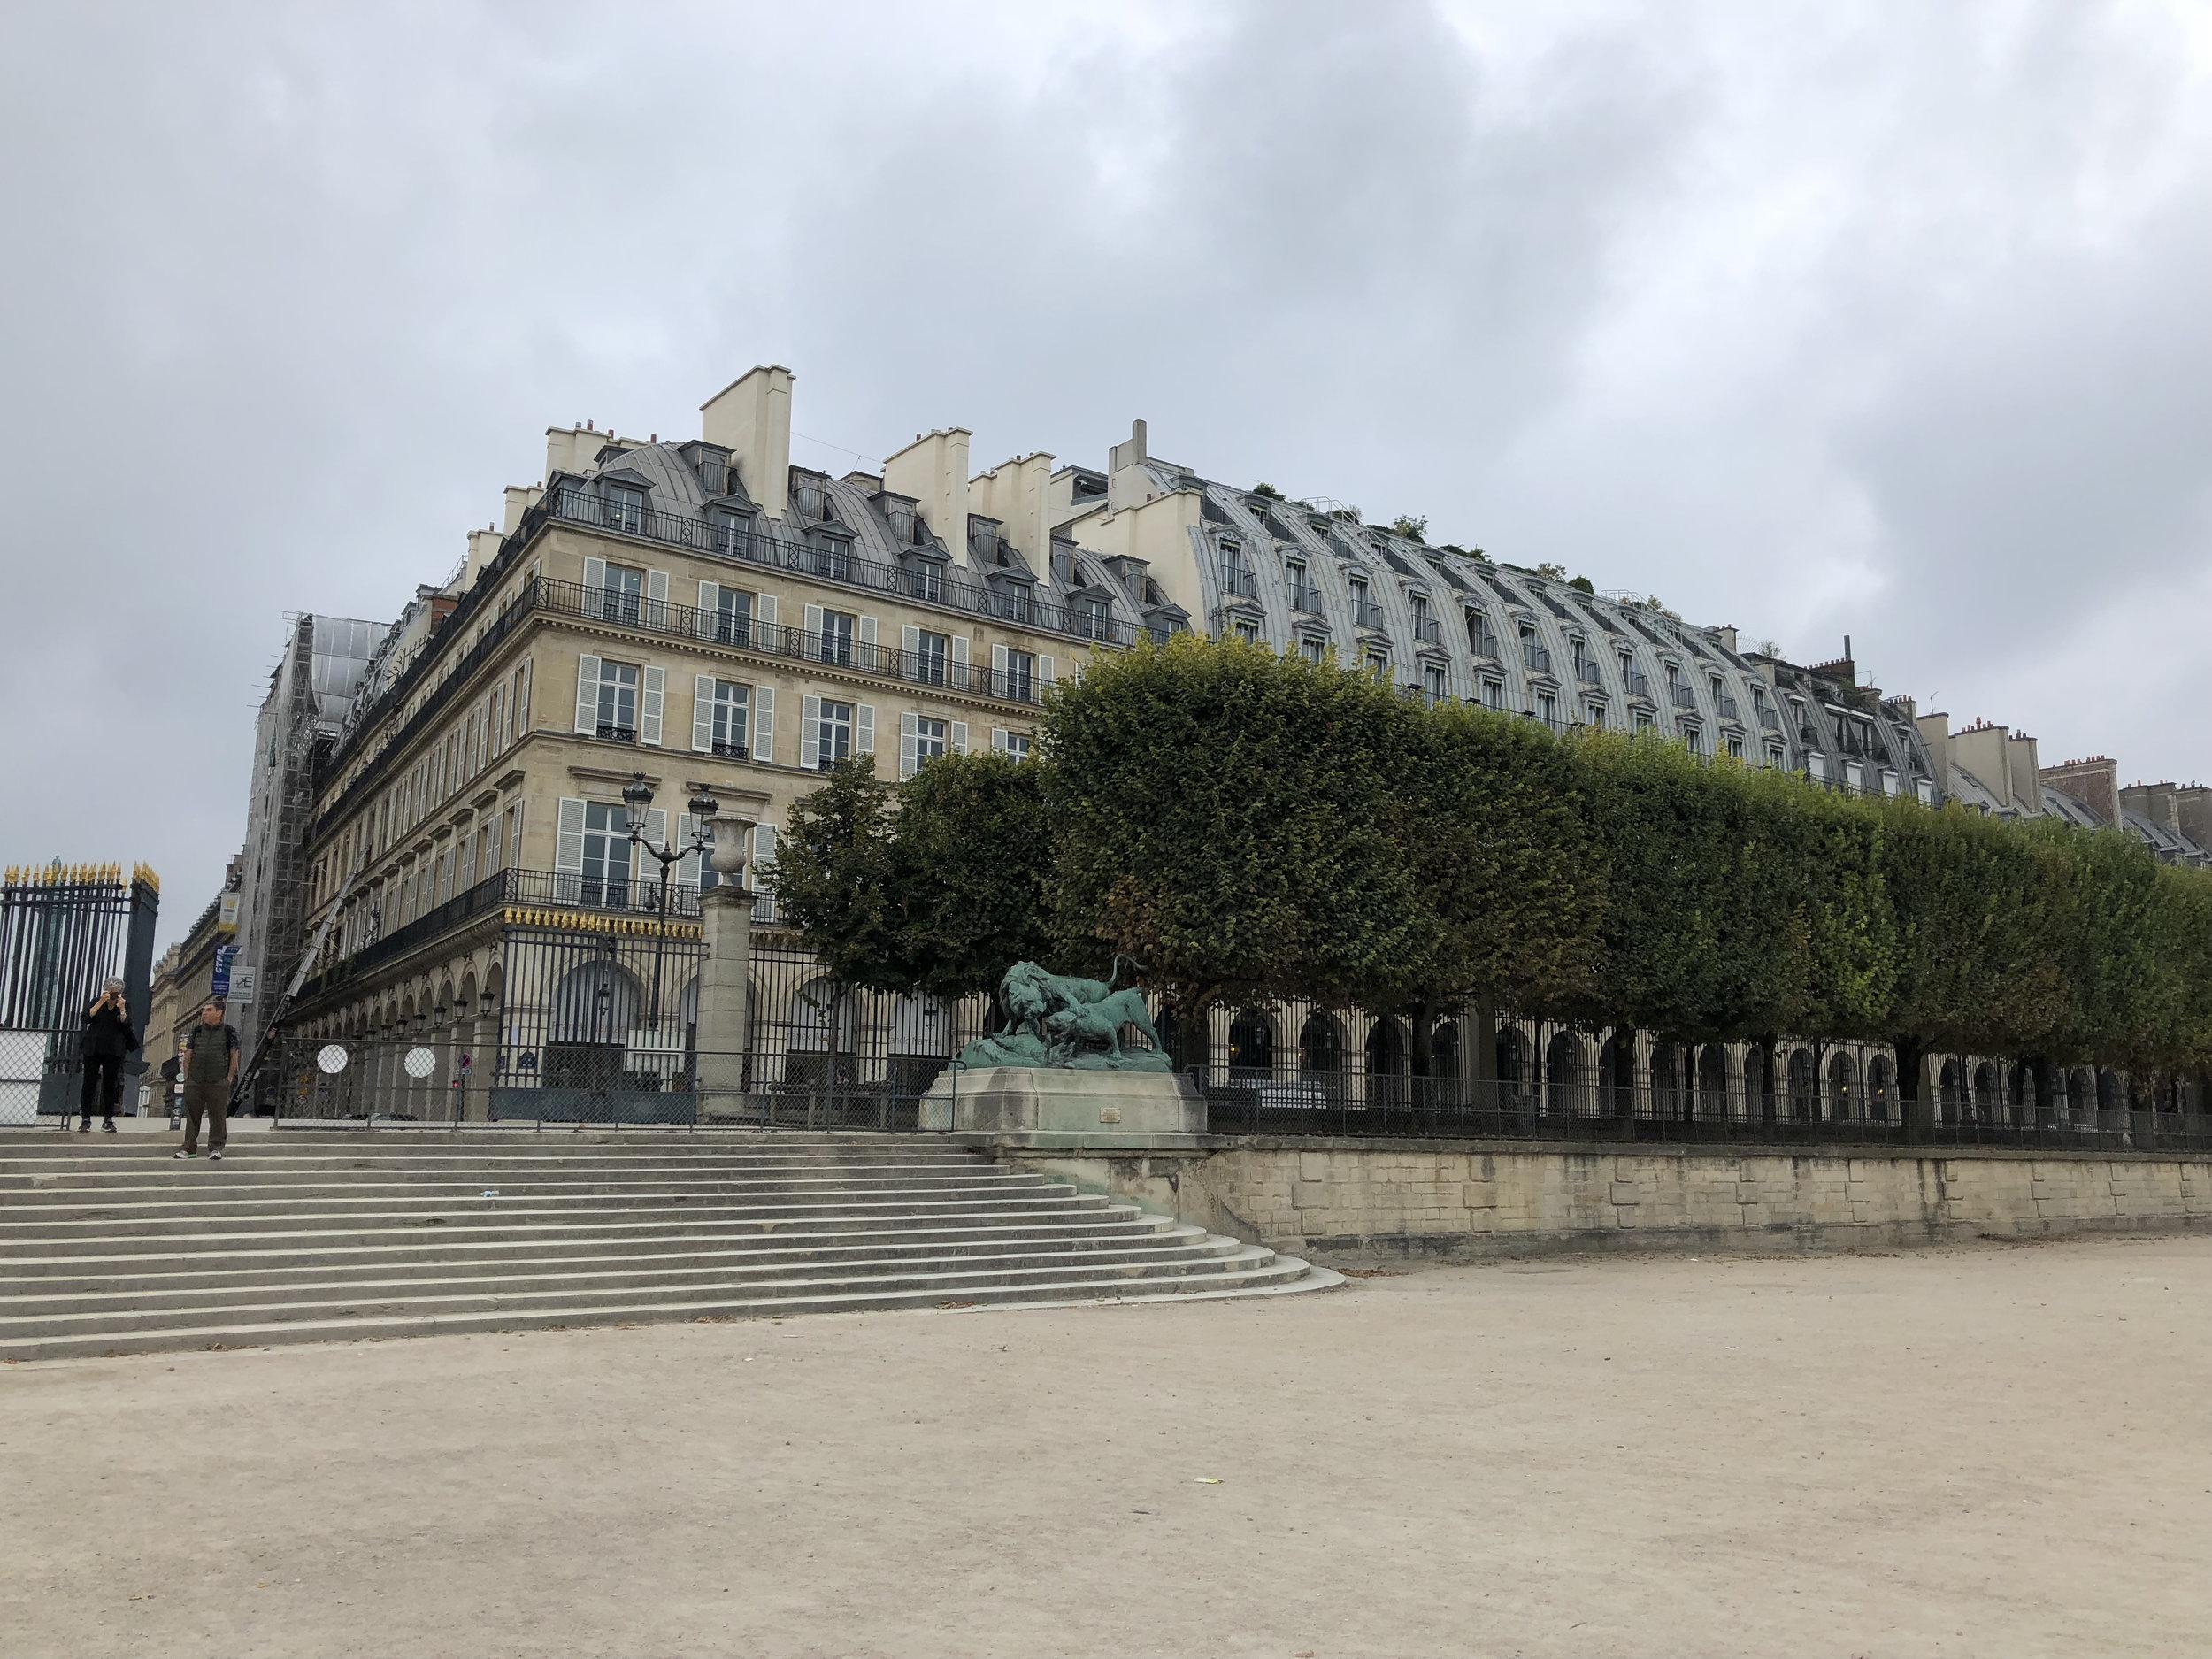 teri_Paris_laura'sbd_monet_giverny_l'orangerie_spiritedtable_photo83.jpg